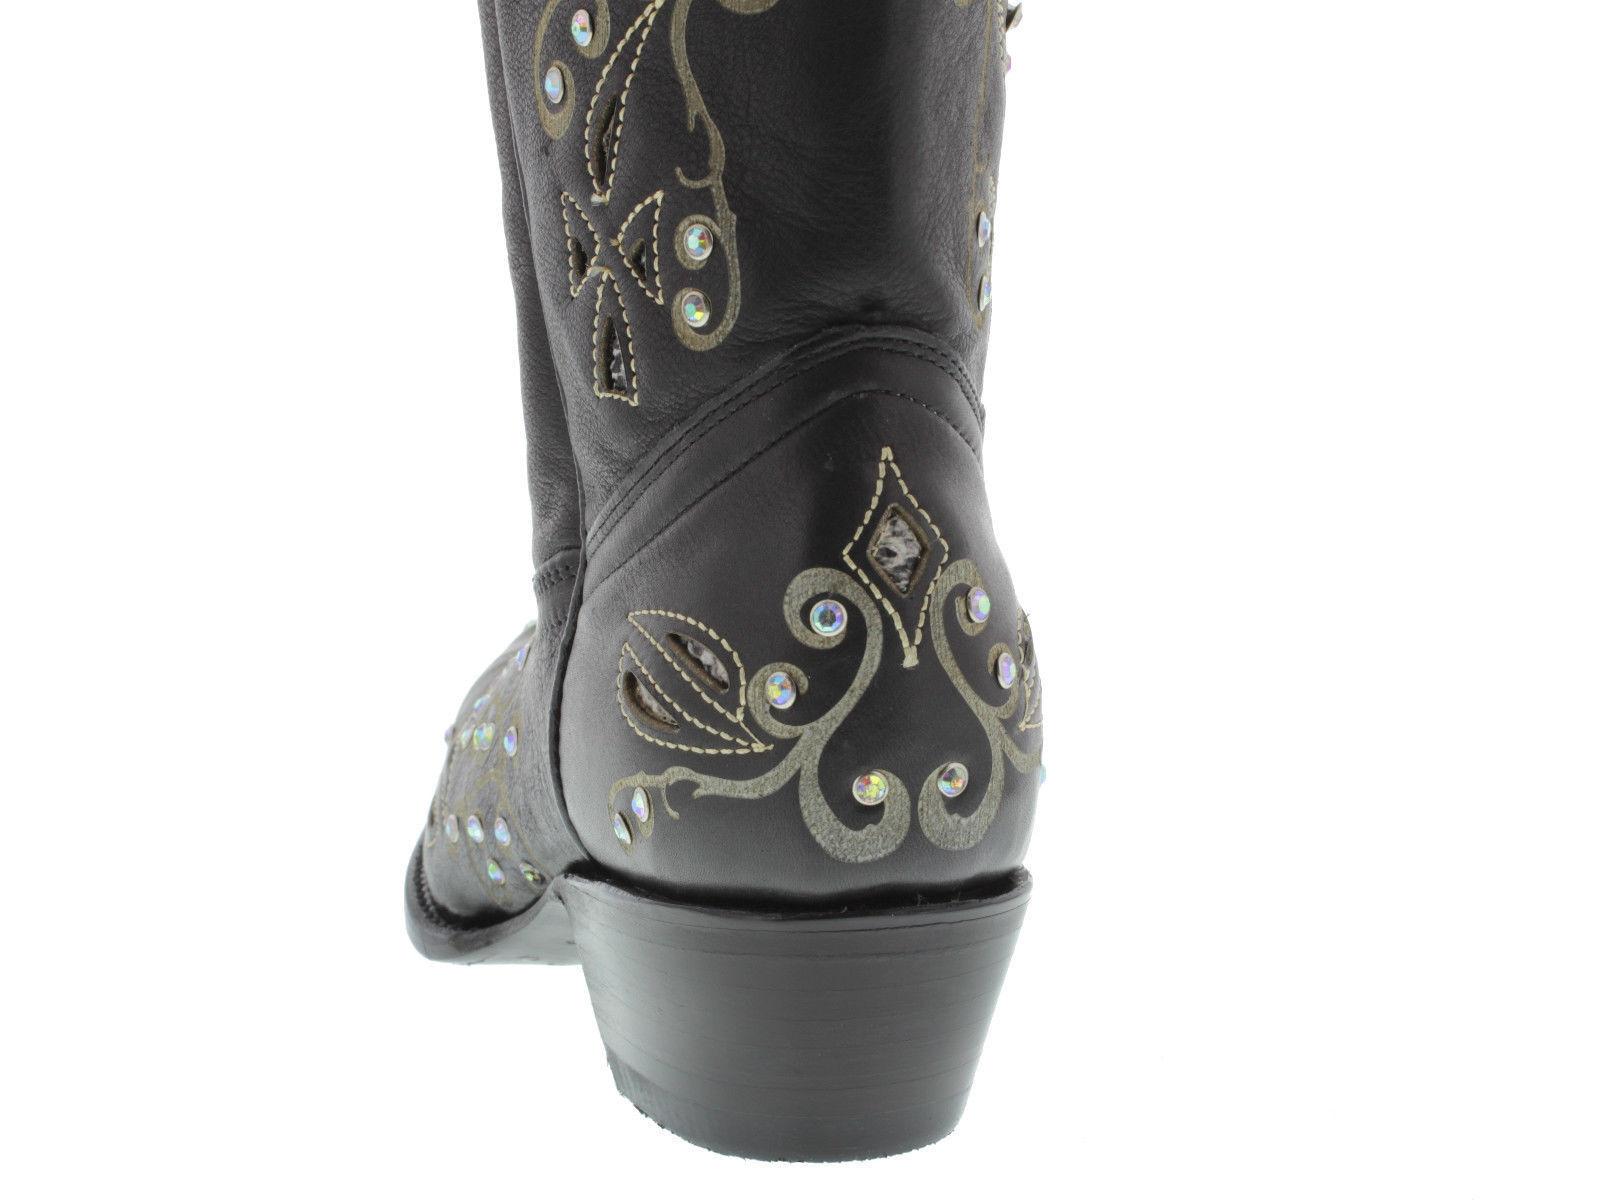 Womens Black Python Inlay Rhinestone Western Leather Leather Leather Cowboy Boots Rodeo Cowgirl 0edd30